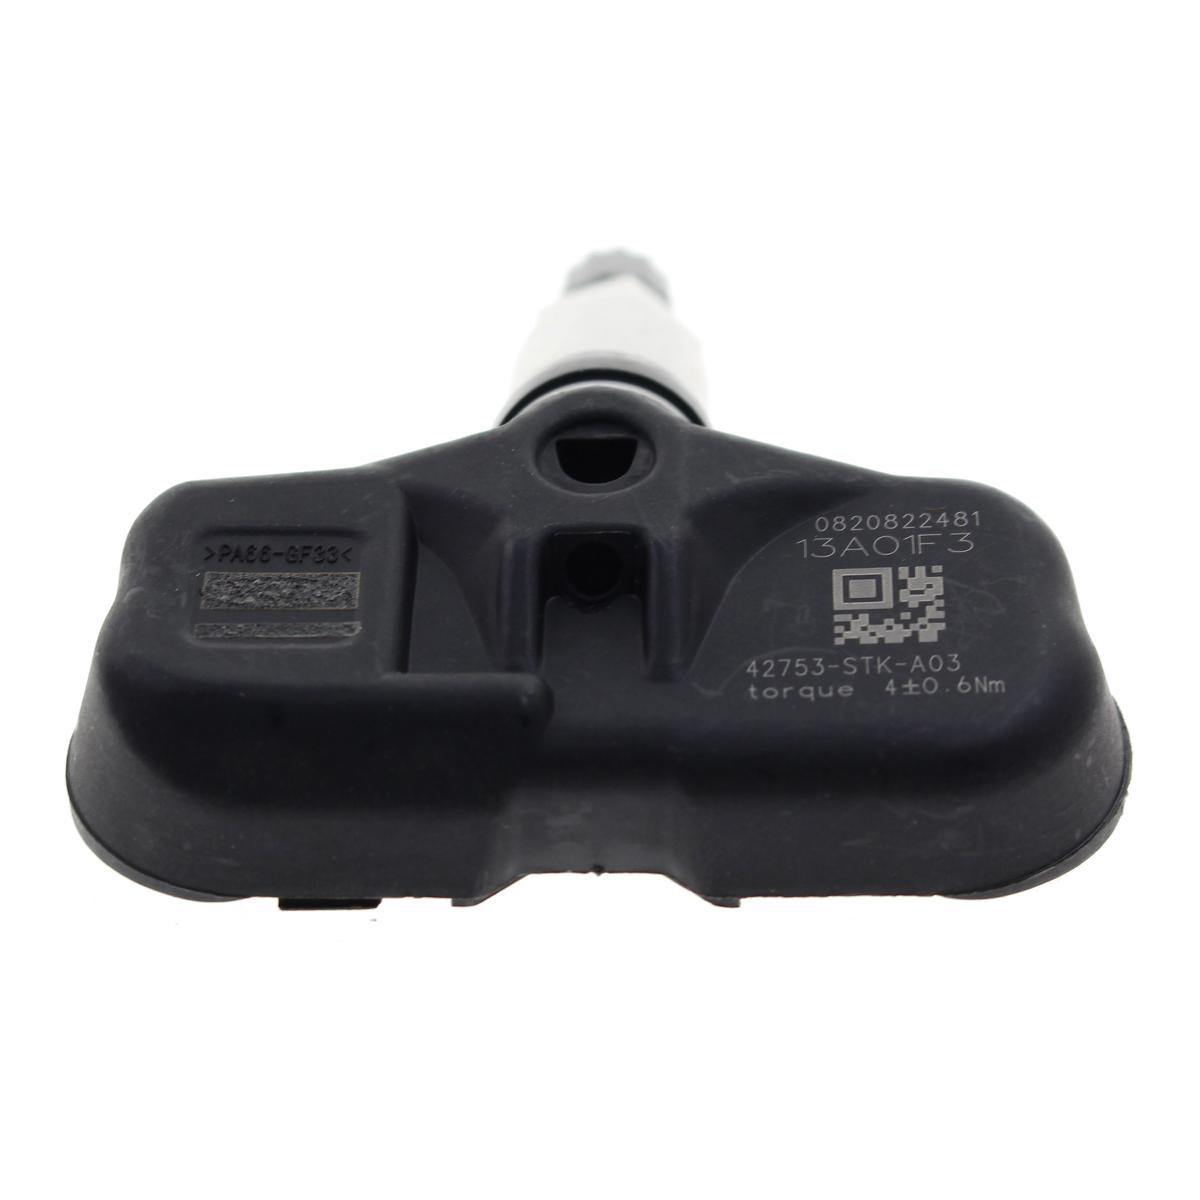 42753-STK-A03 Tire Pressure Sensor TPMS 315MHz For Honda